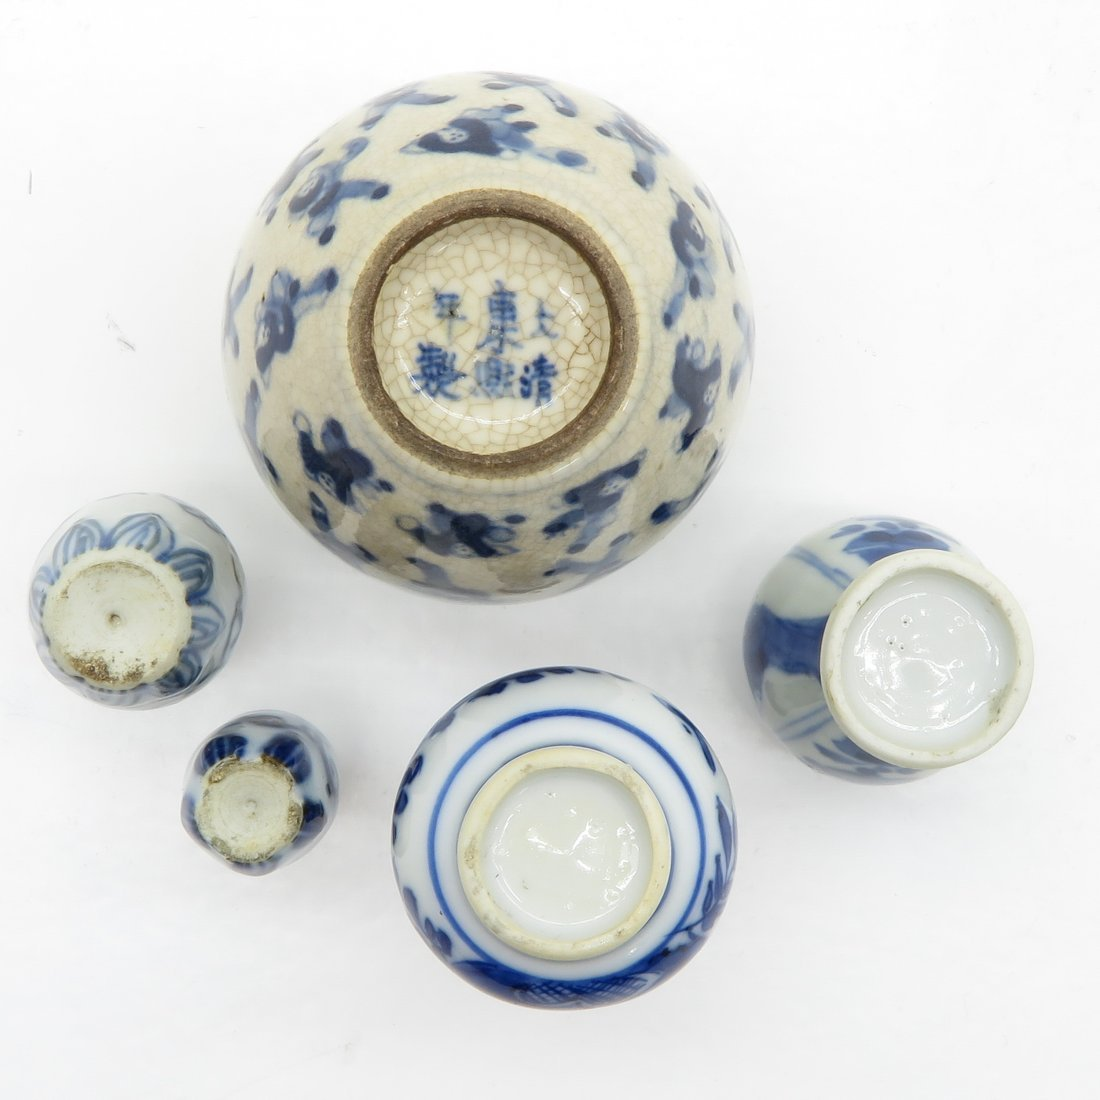 Diverse Lot of China Porcelain - 6